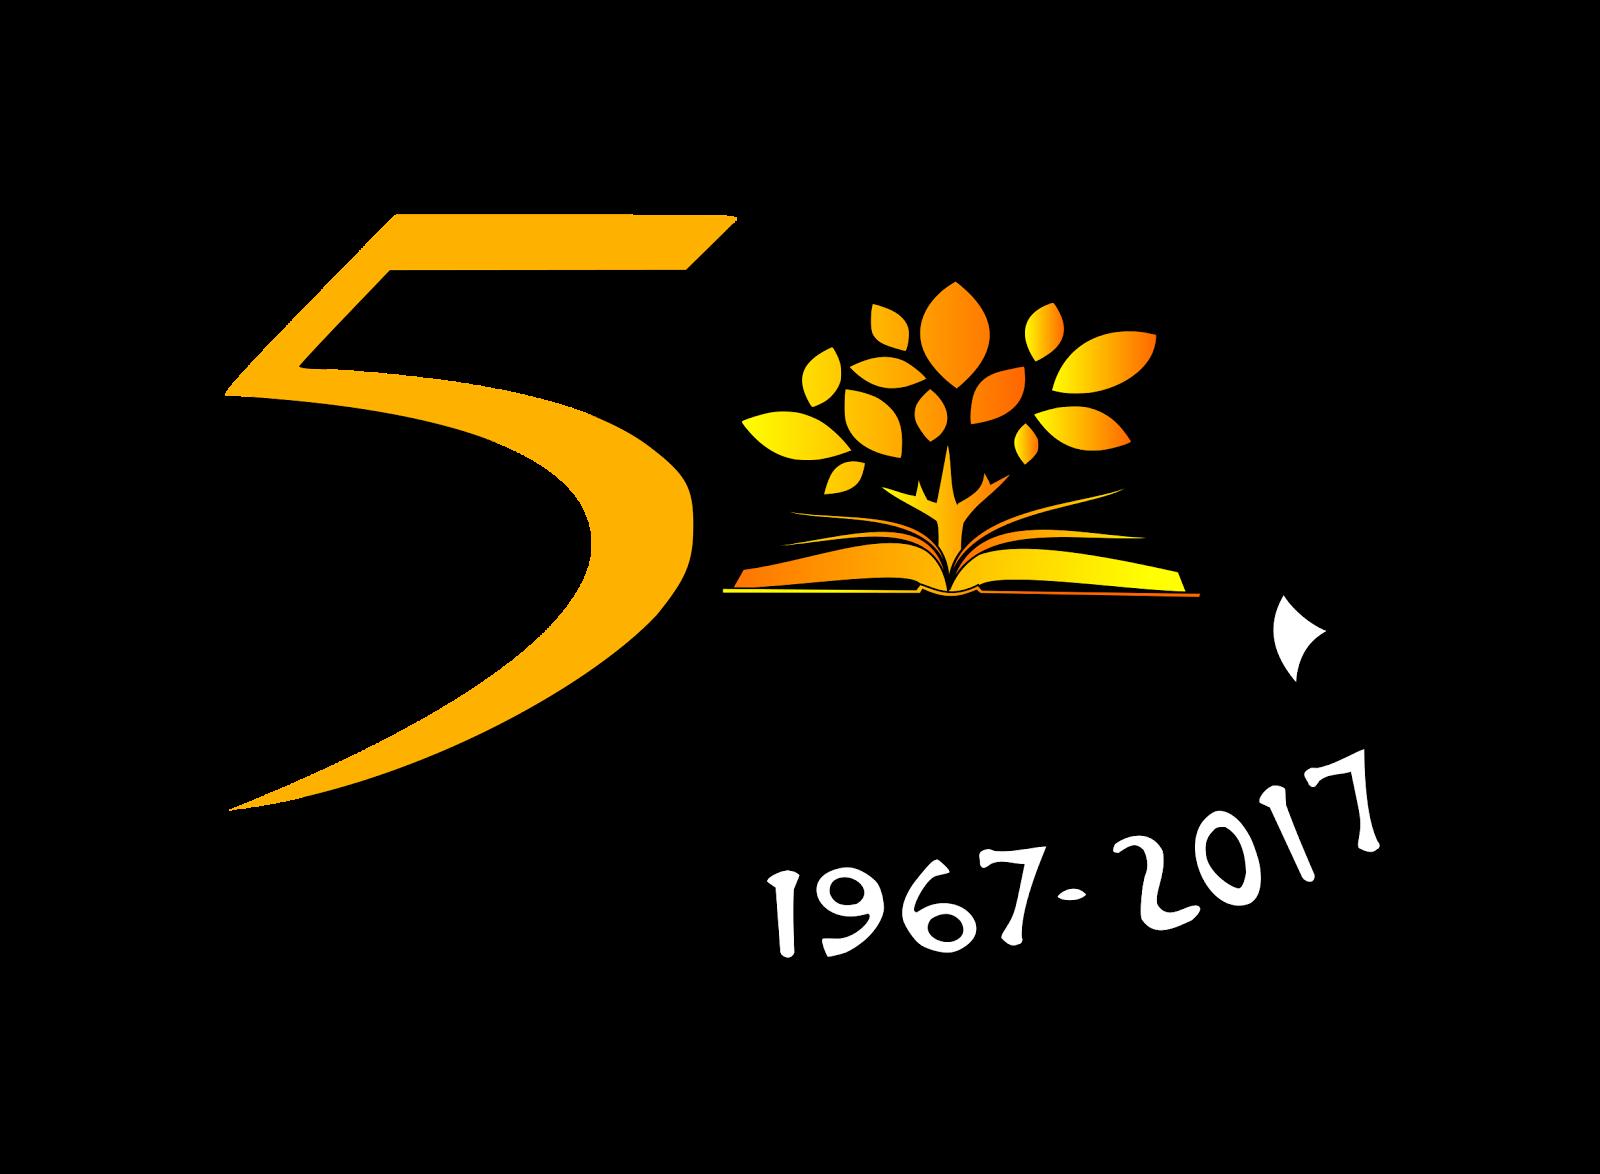 50 Aniversario 1967 - 2017